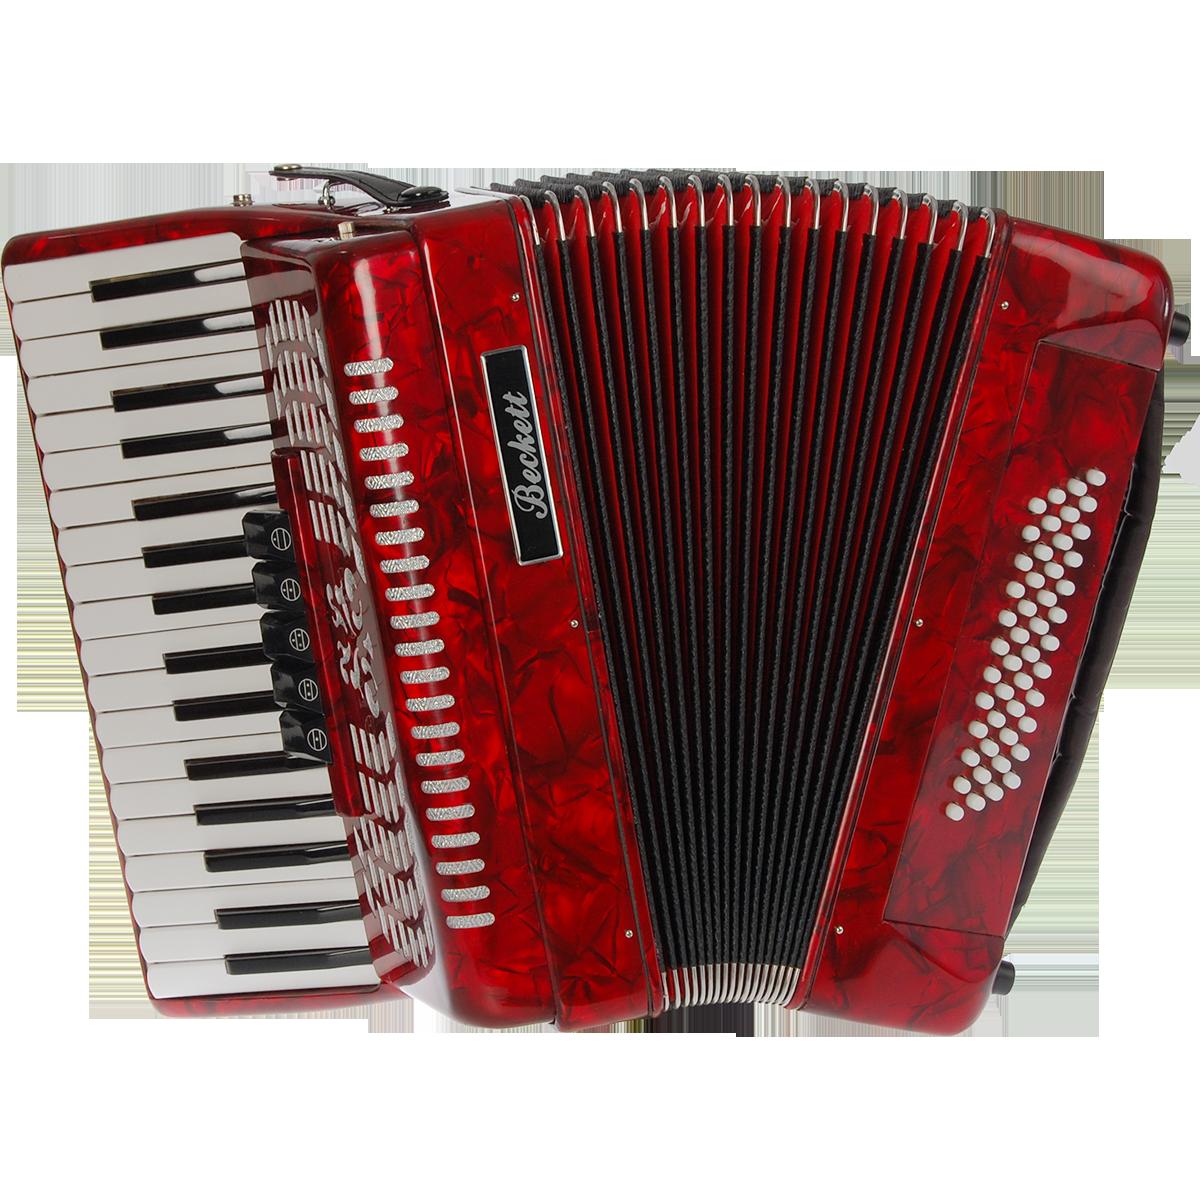 Billede af Beckett JH2005 piano-harmonika rød